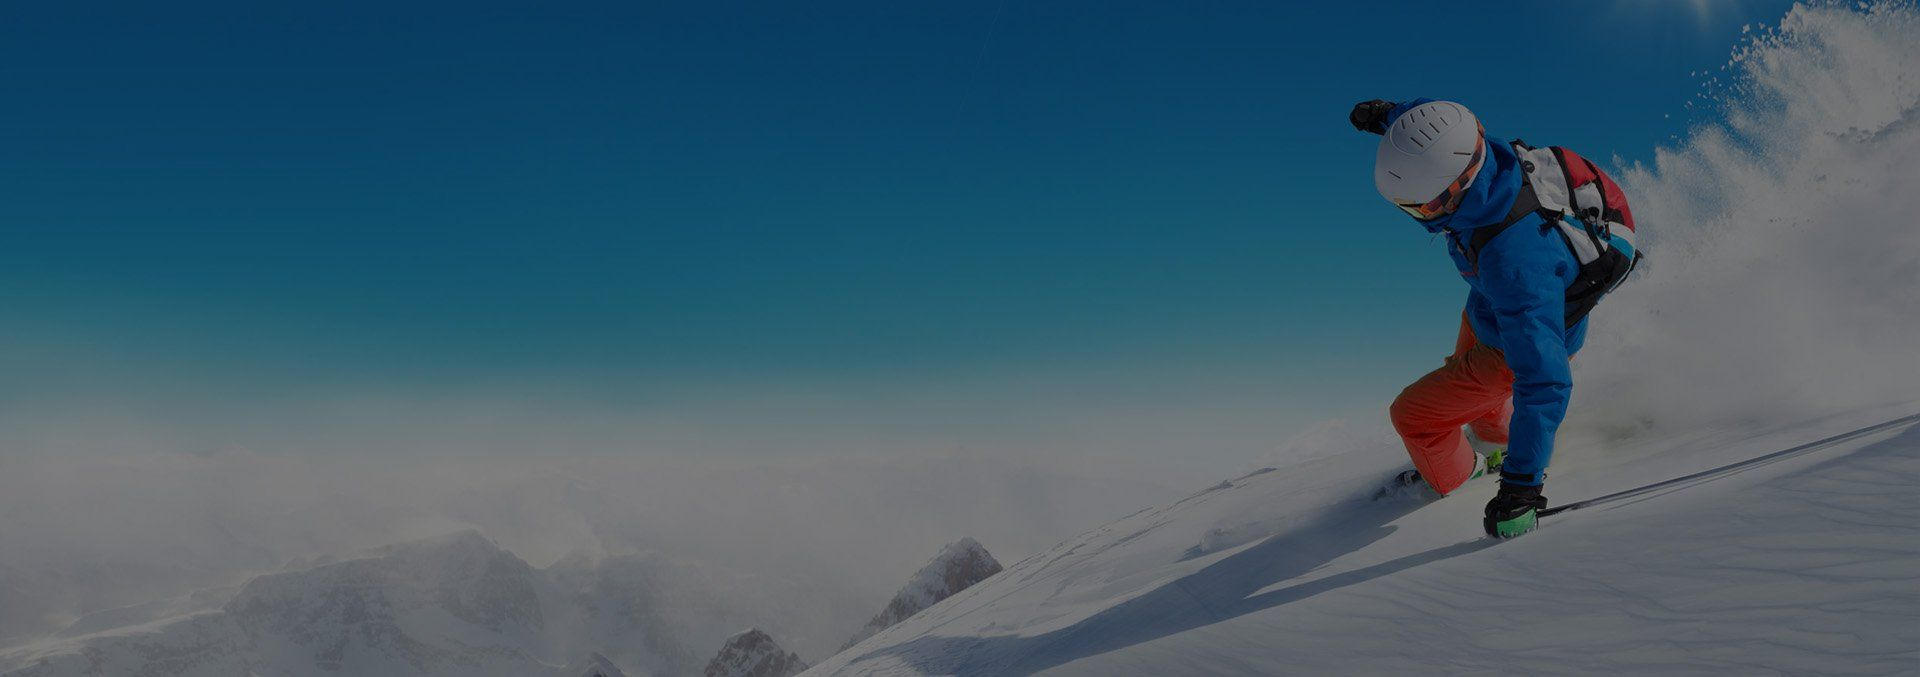 Sciatore che fa una curva in neve fresca